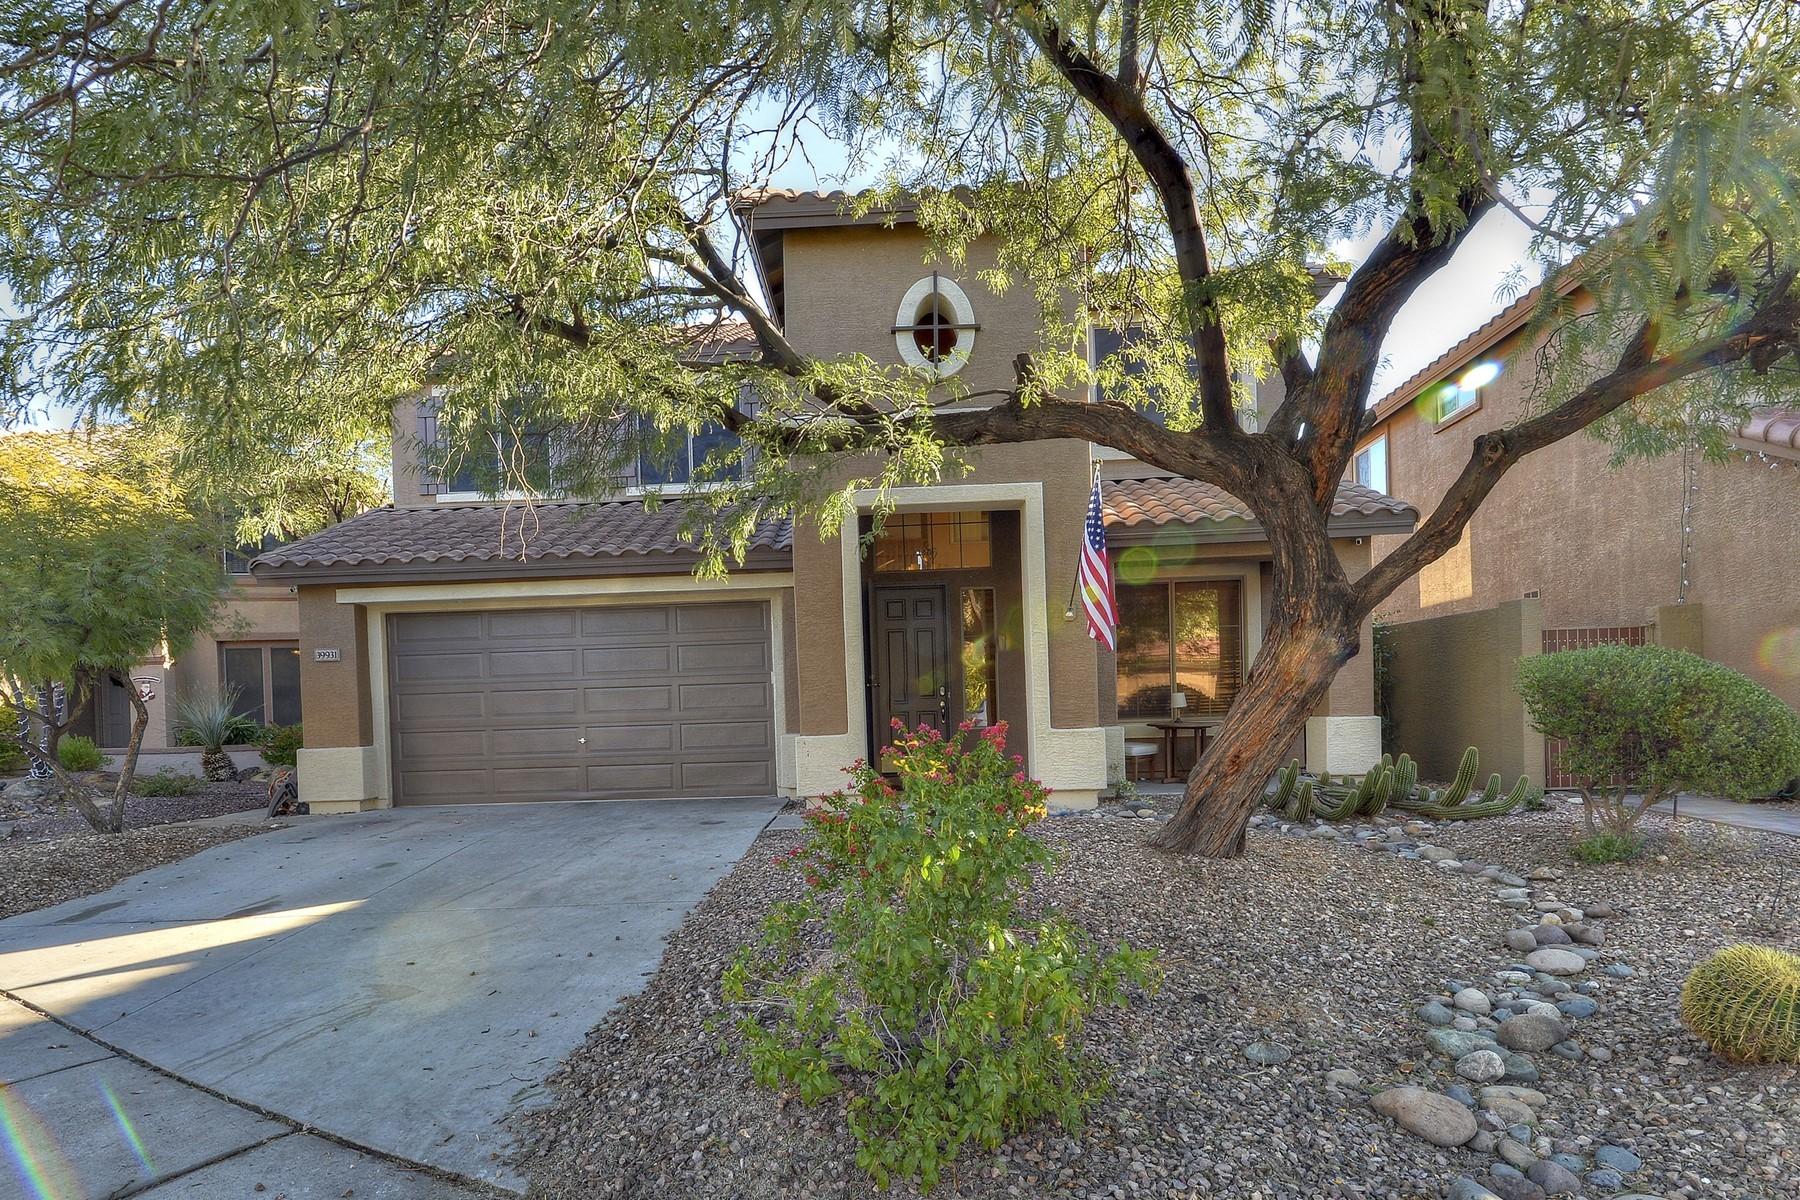 Single Family Homes for Active at Anthem Parkside 39931 N WISDOM WAY Anthem, Arizona 85086 United States